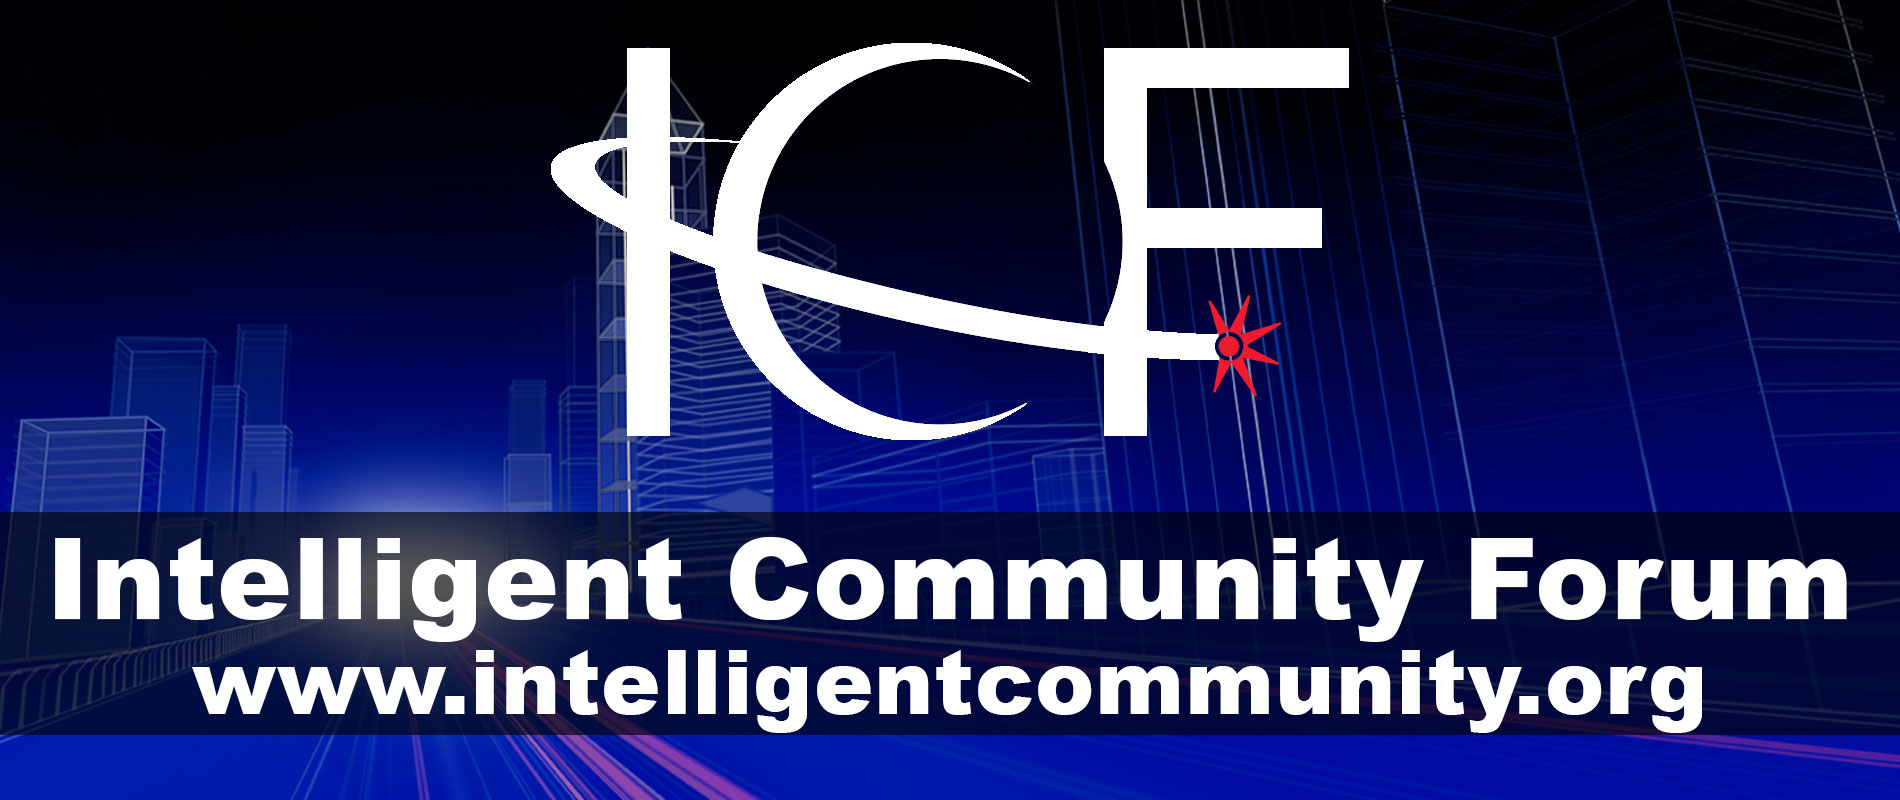 ICF-Banner-Image-1.jpg